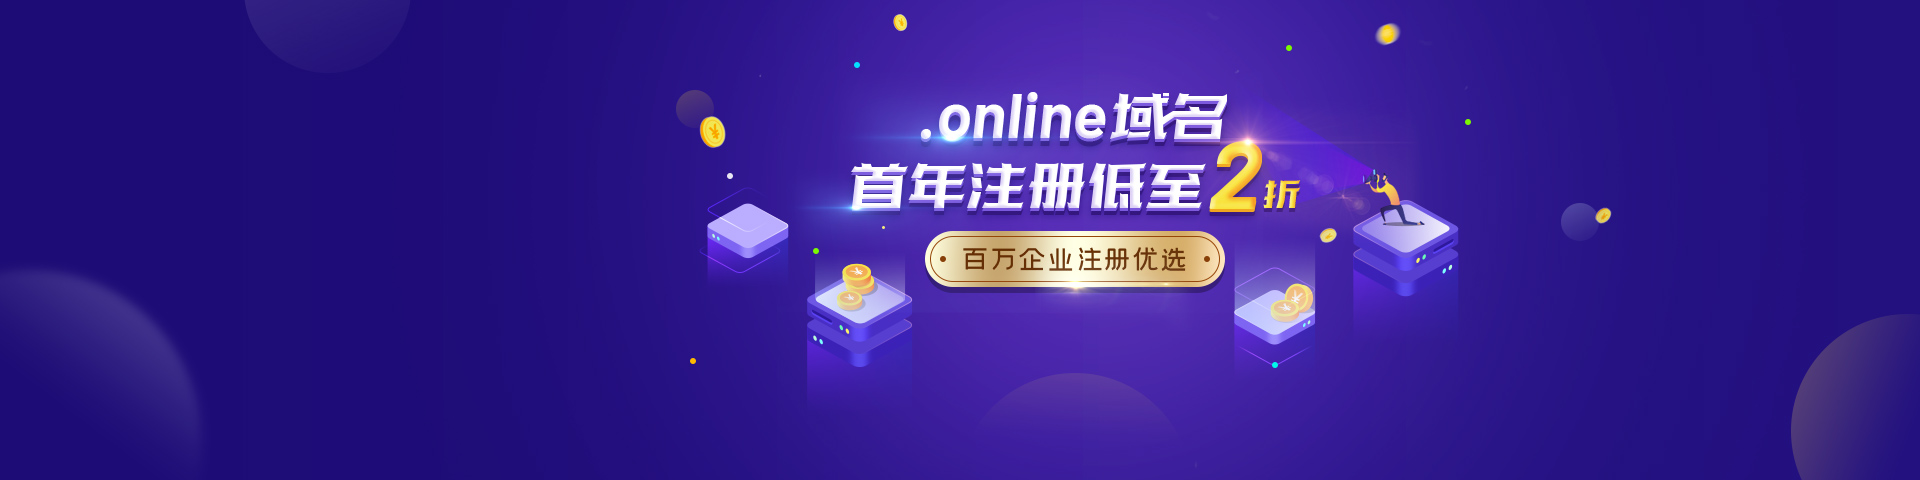 online首年注册